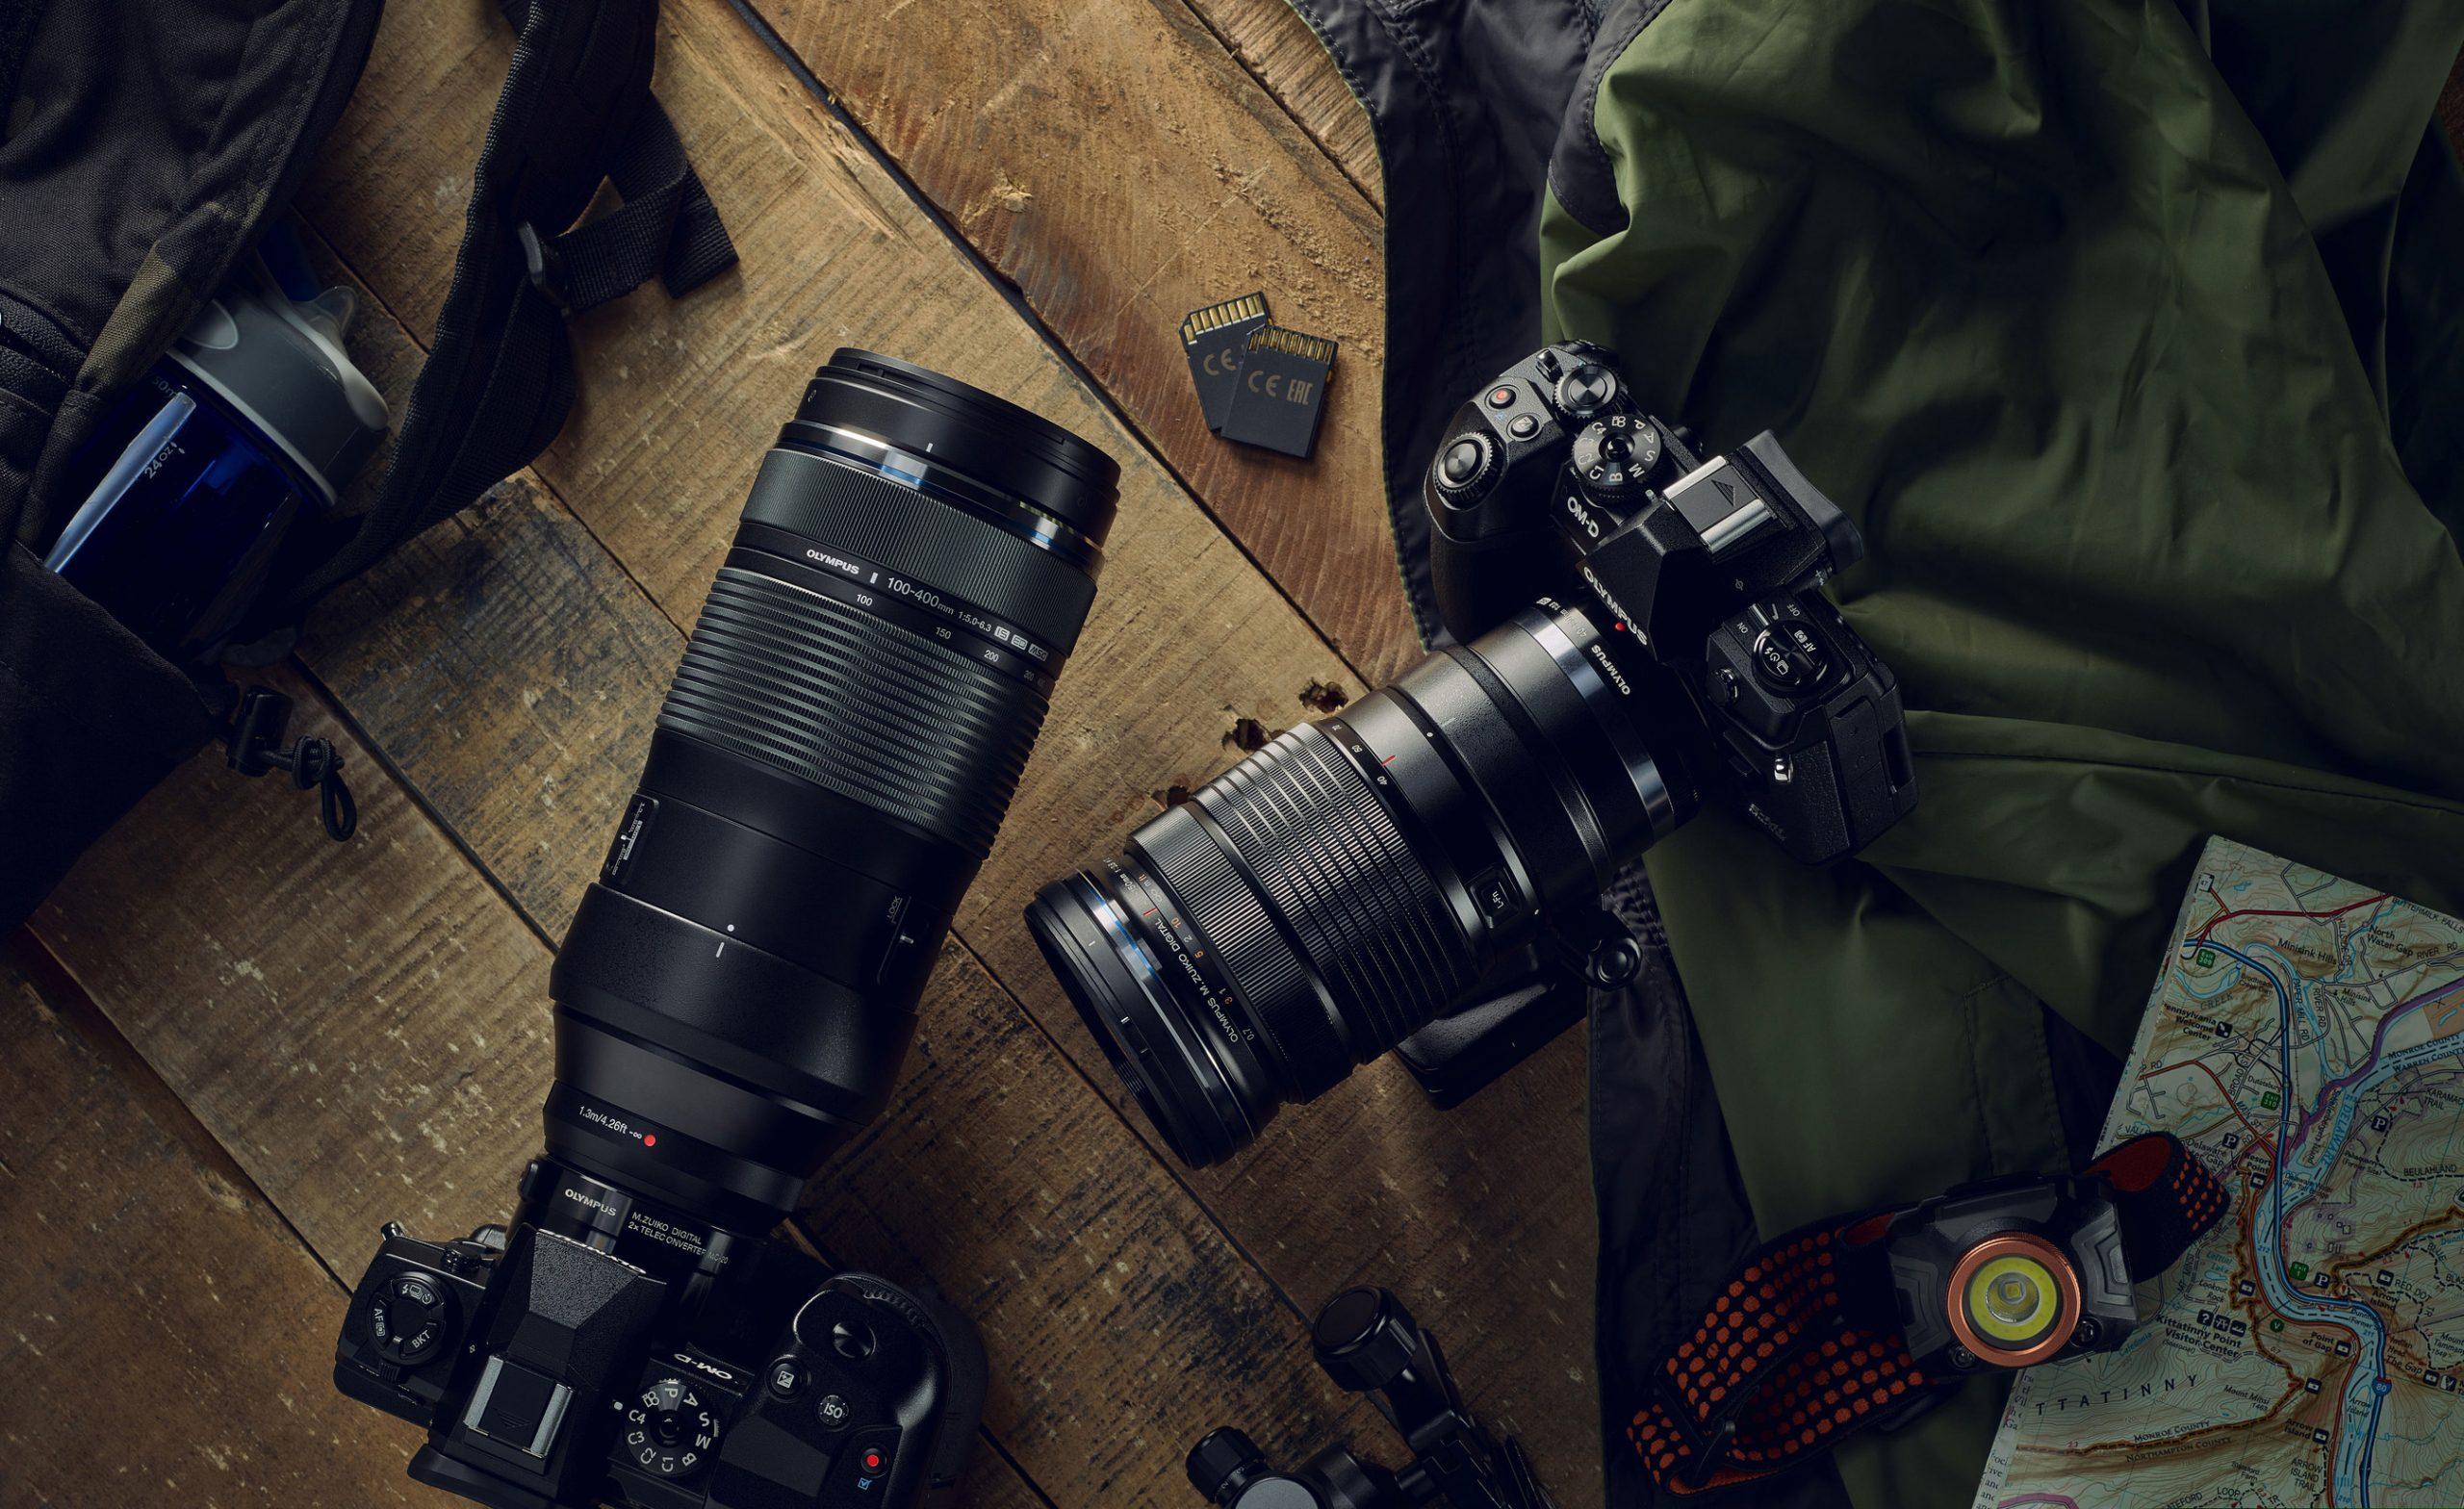 The M.Zuiko® Digital ED 100-400mm F5.0-6.3 IS lens